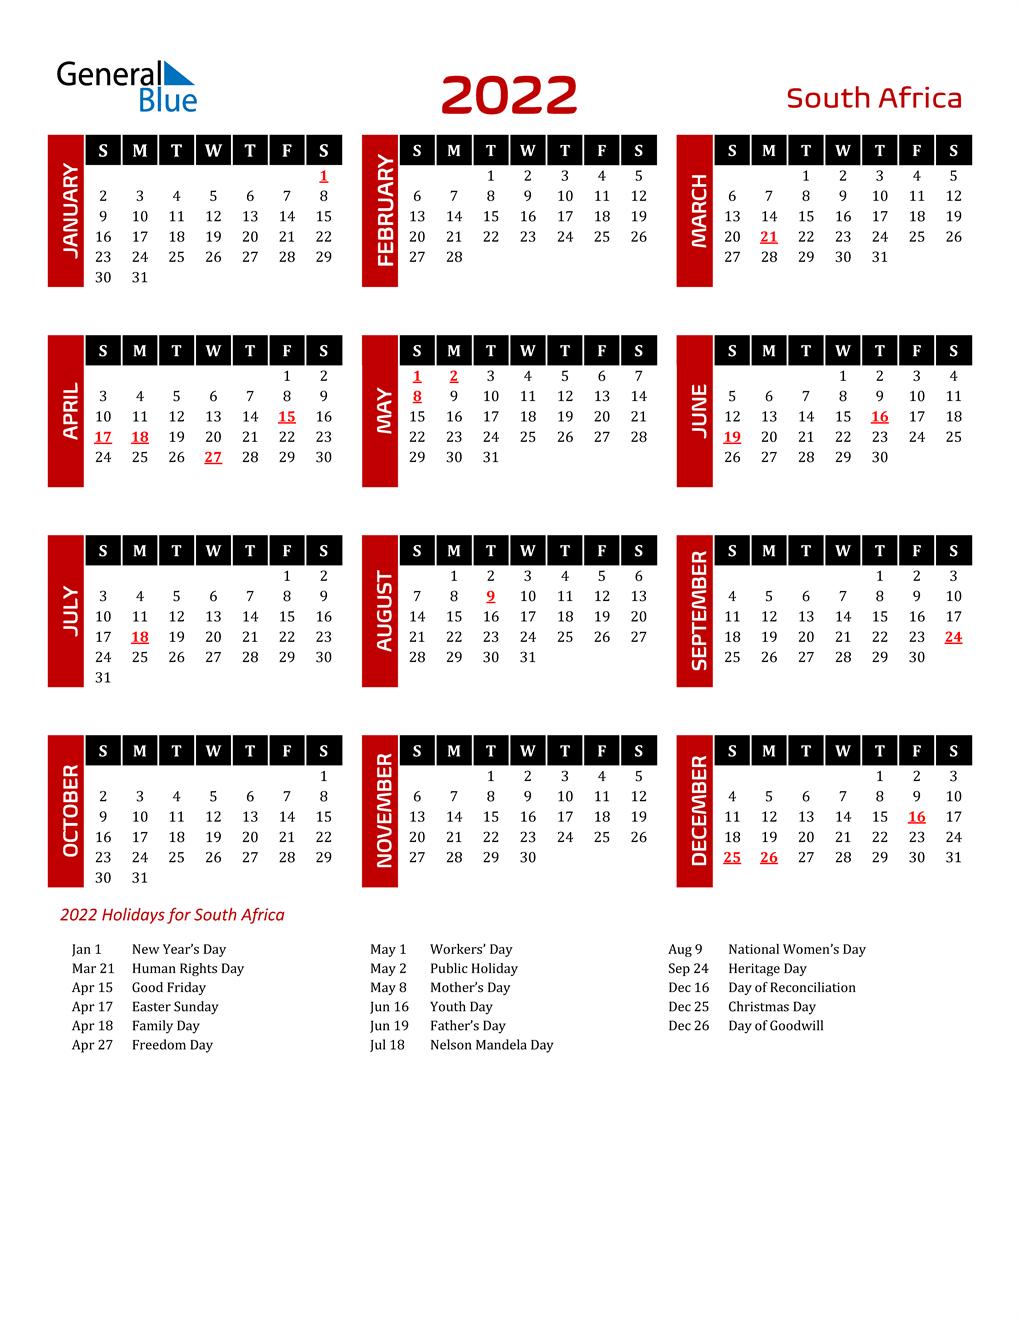 2022 South Africa Calendar With Holidays